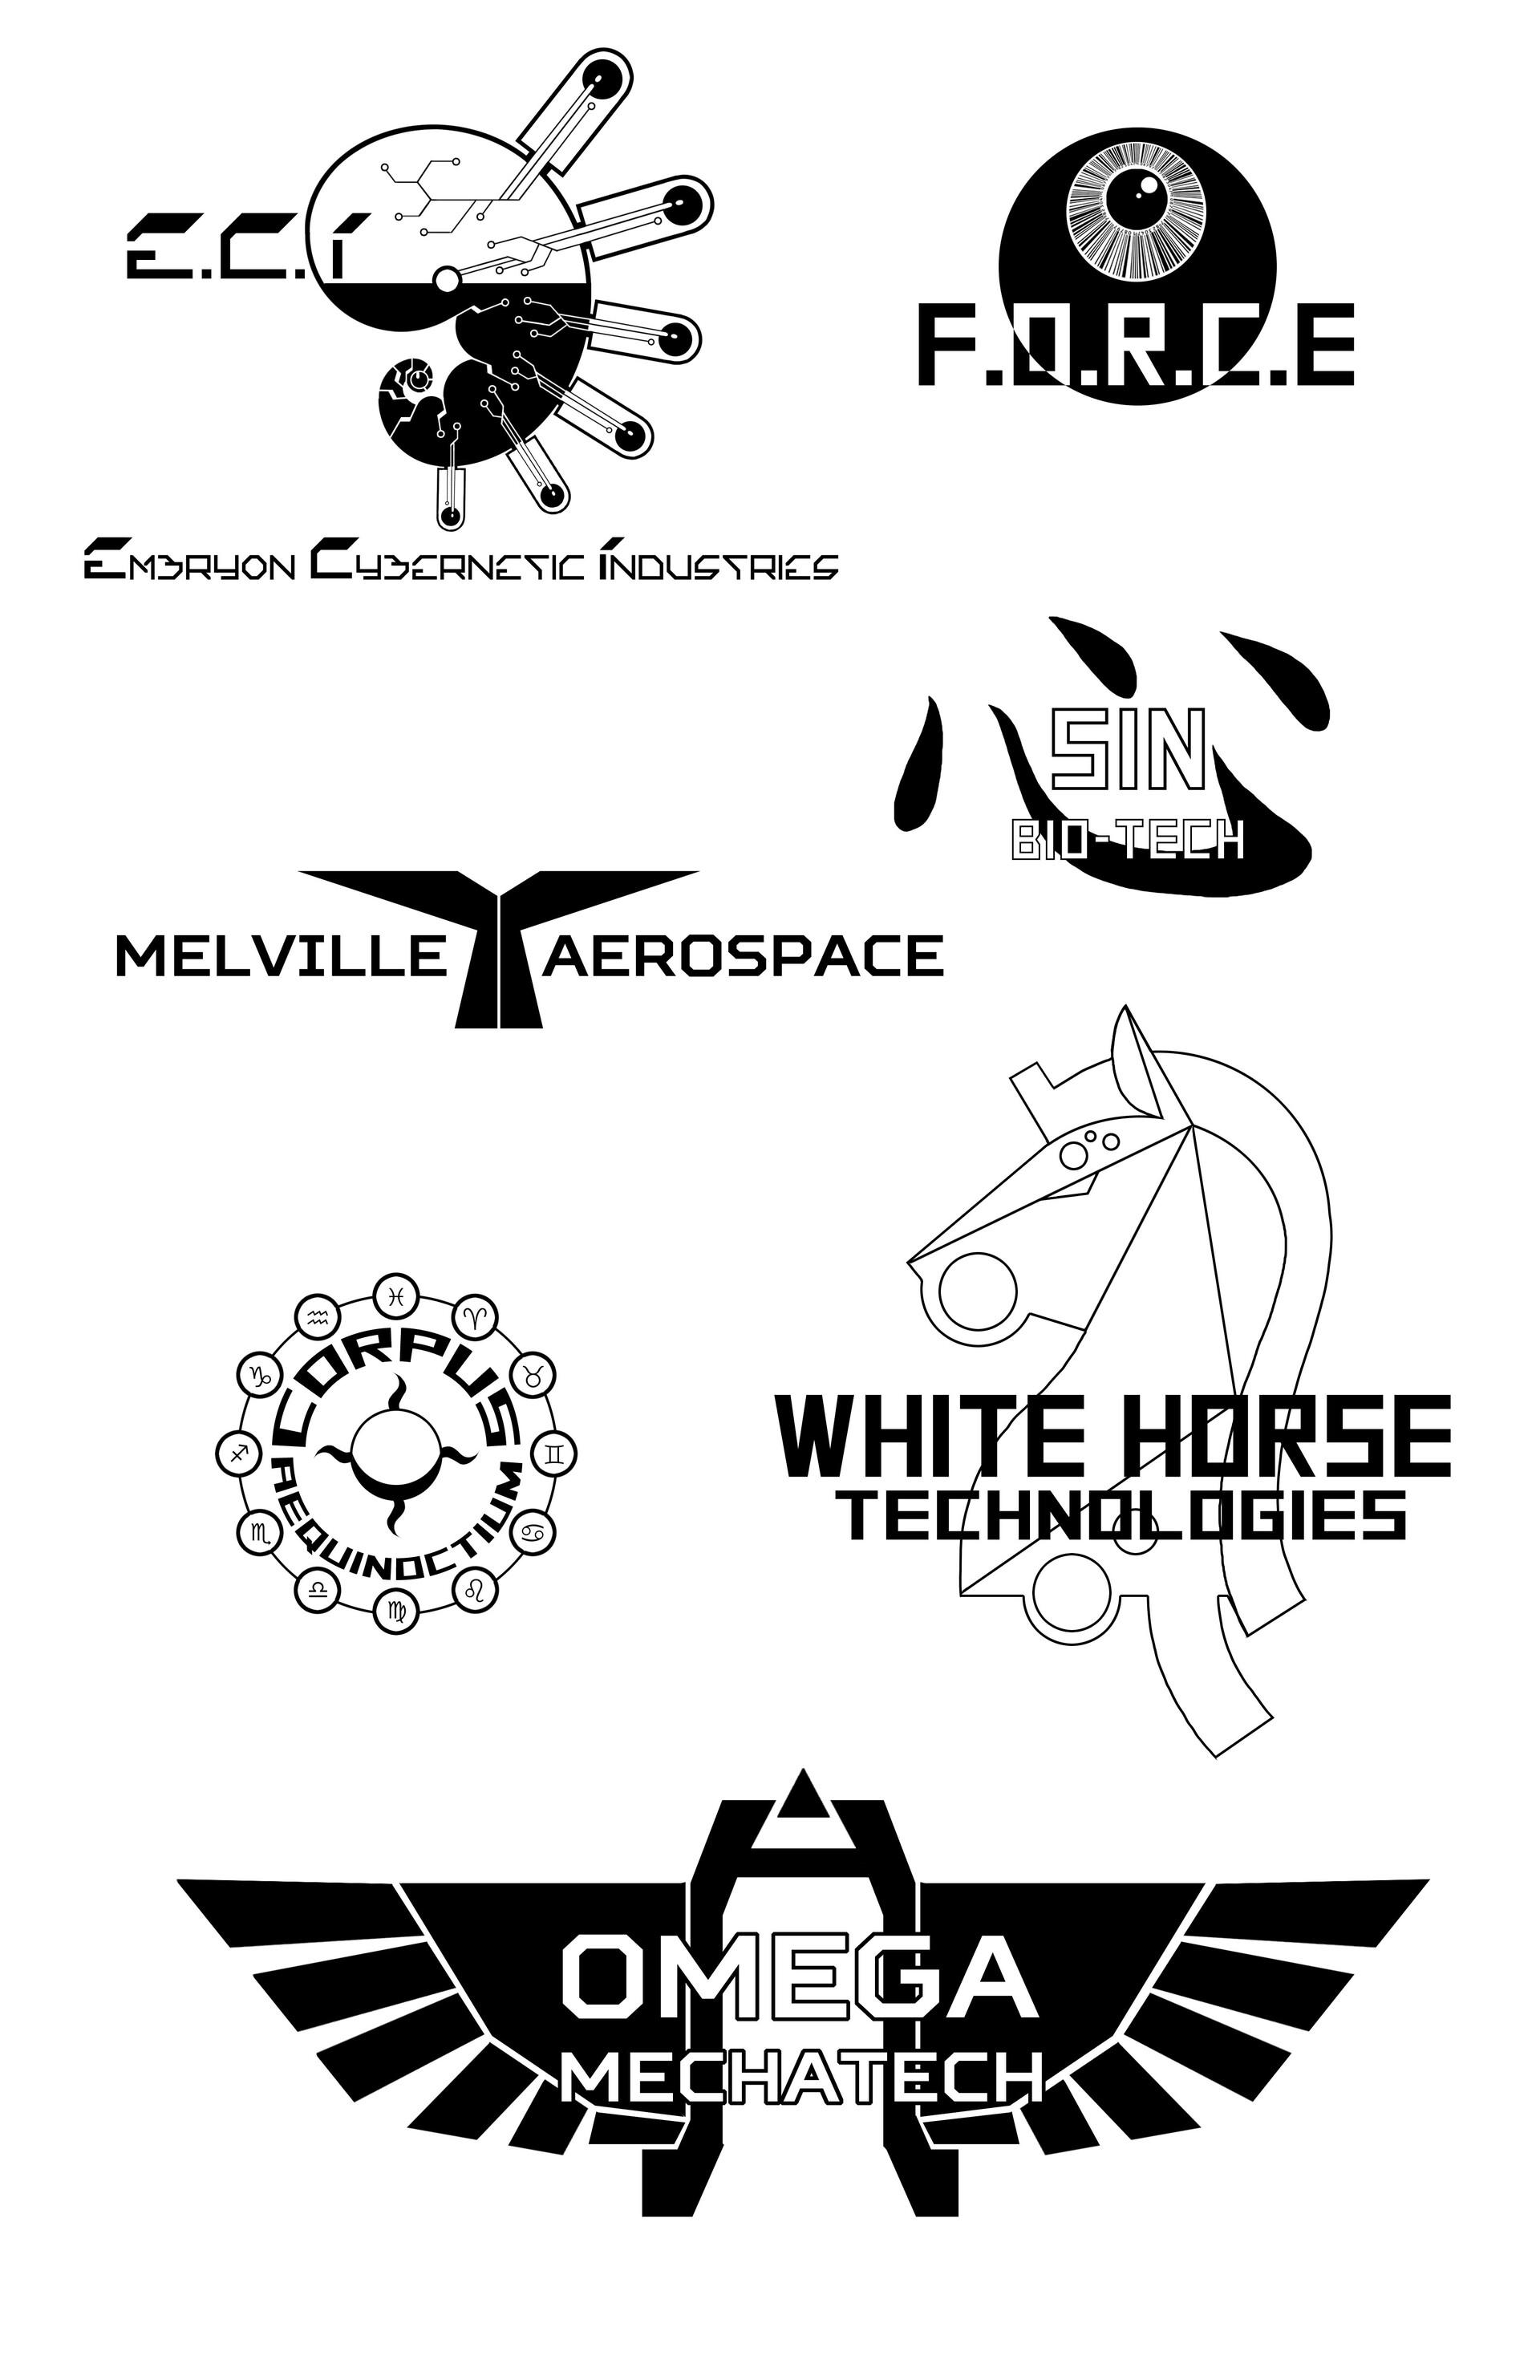 Max haig logos